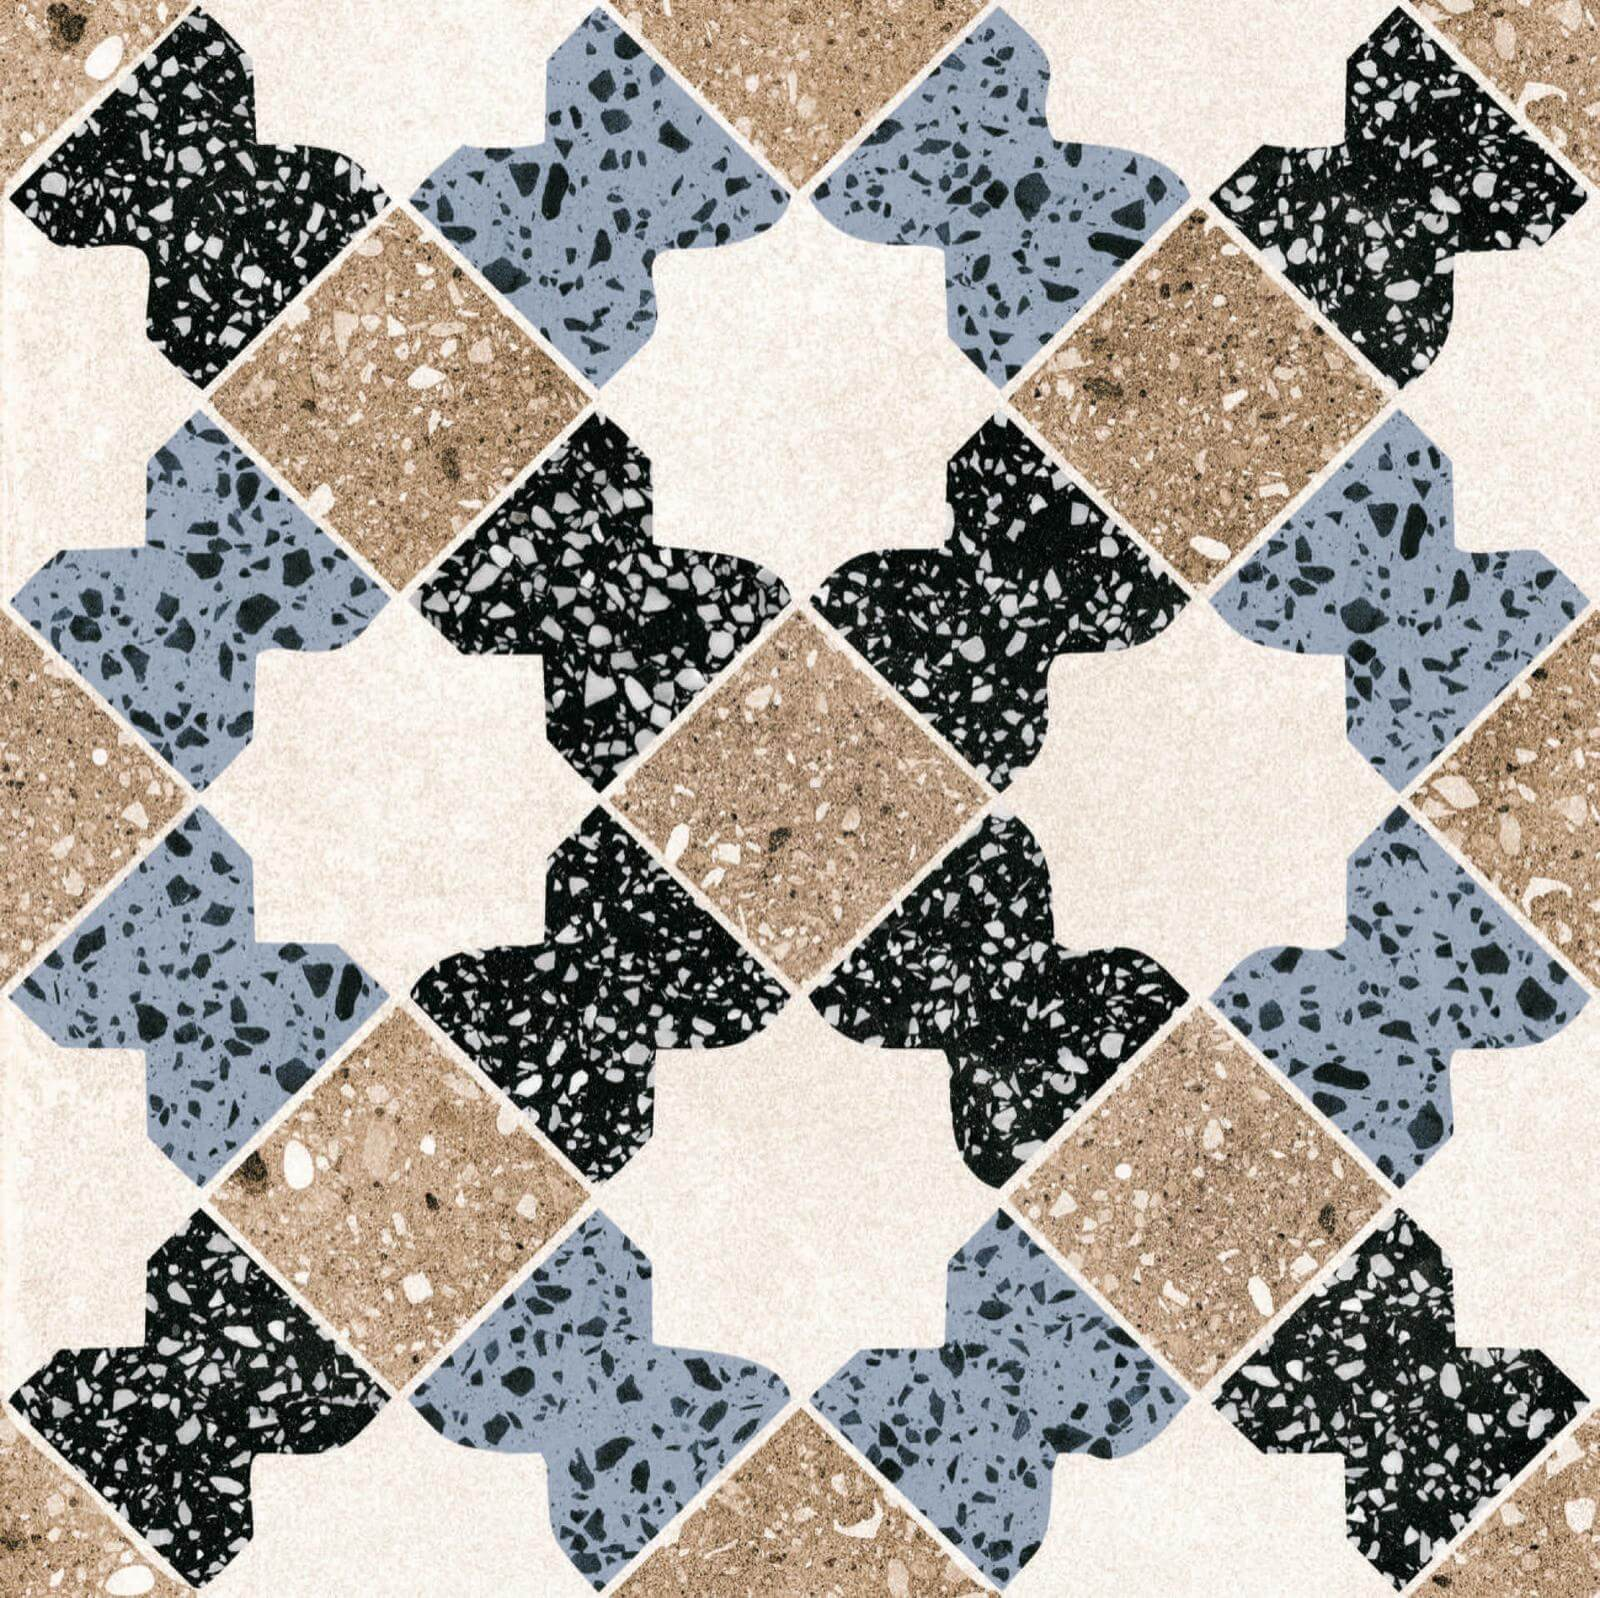 Универсальная плитка Azulindus & Marti Palazzo Vulcano 25x25 (1) peter marti baustatik grundlagen stabtragwerke flächentragwerk